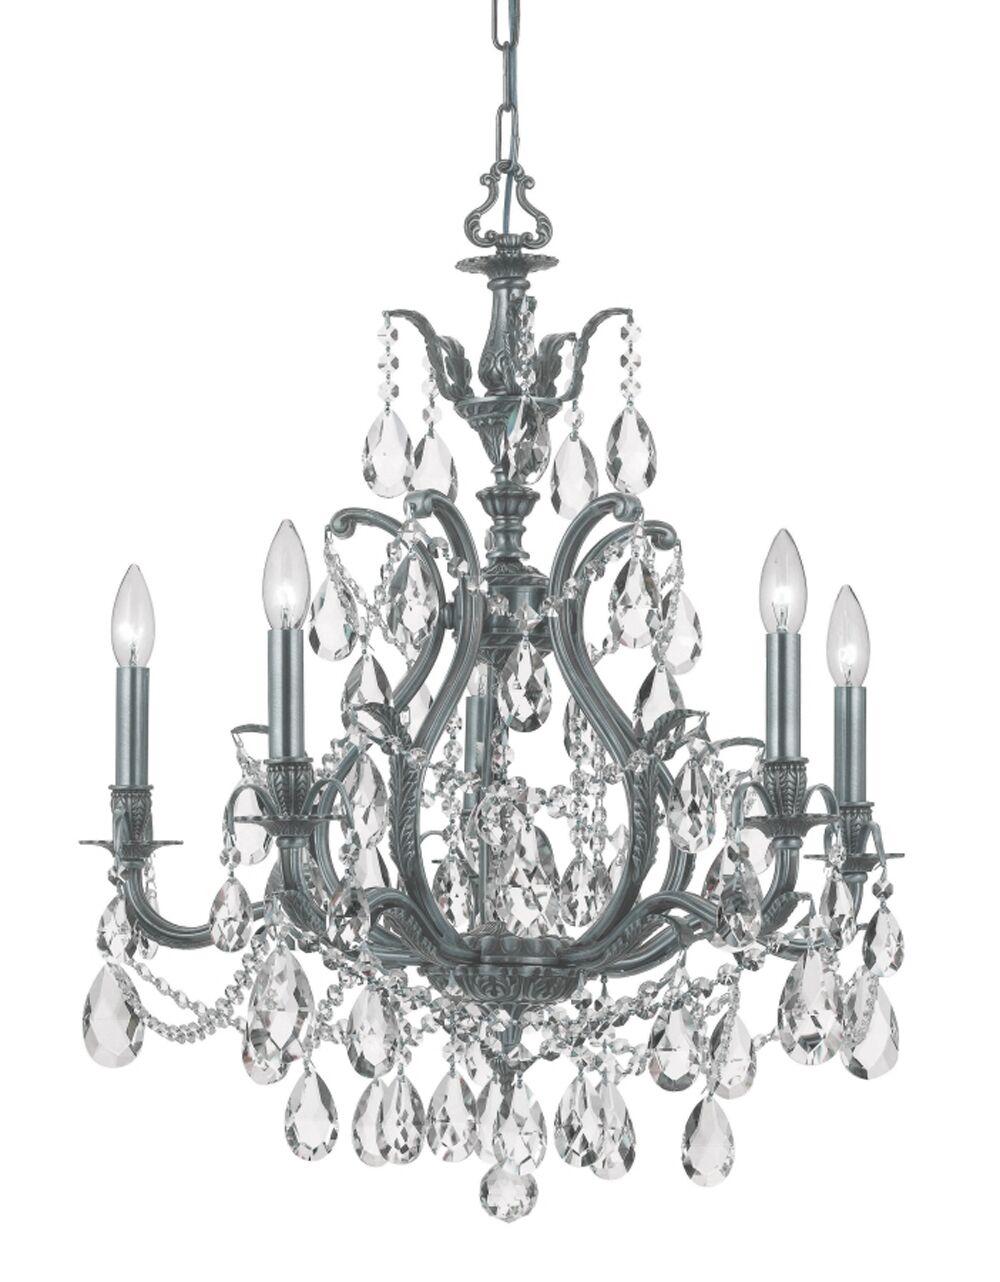 Dawson 5-Light Candle Style Chandelier Crystal Type: Swarovski Elements, Finish: Pewter